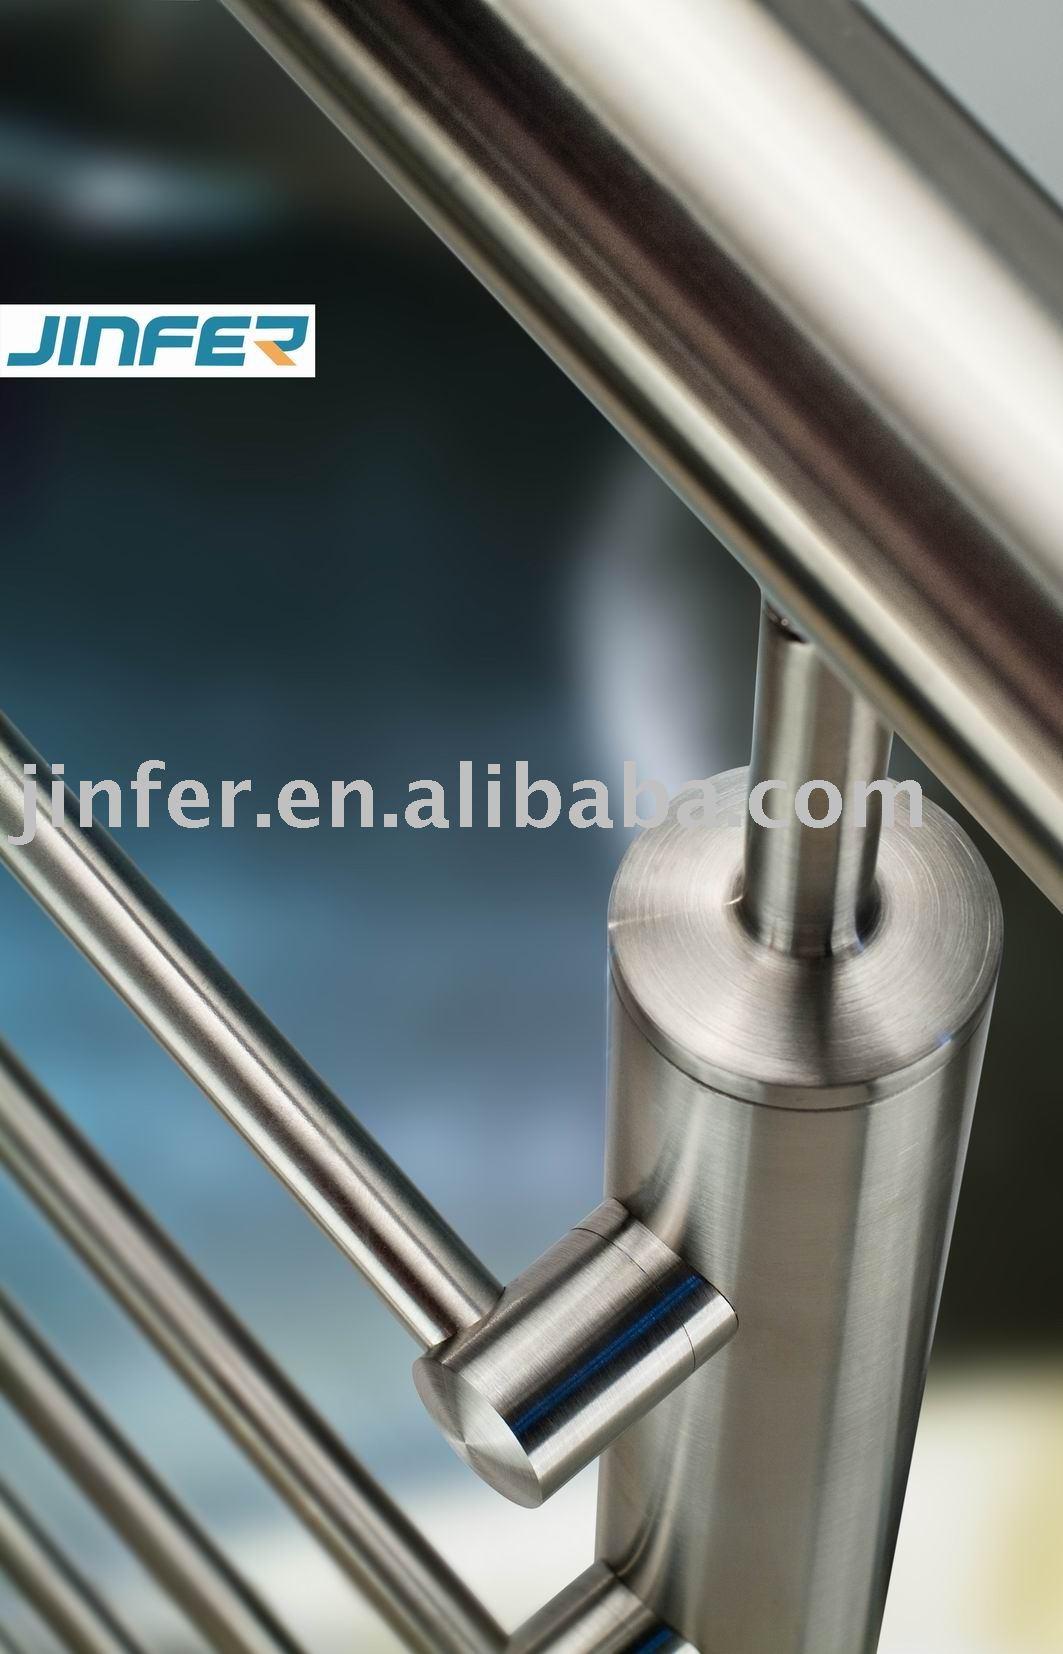 Balcony balustrade stainless steel railing